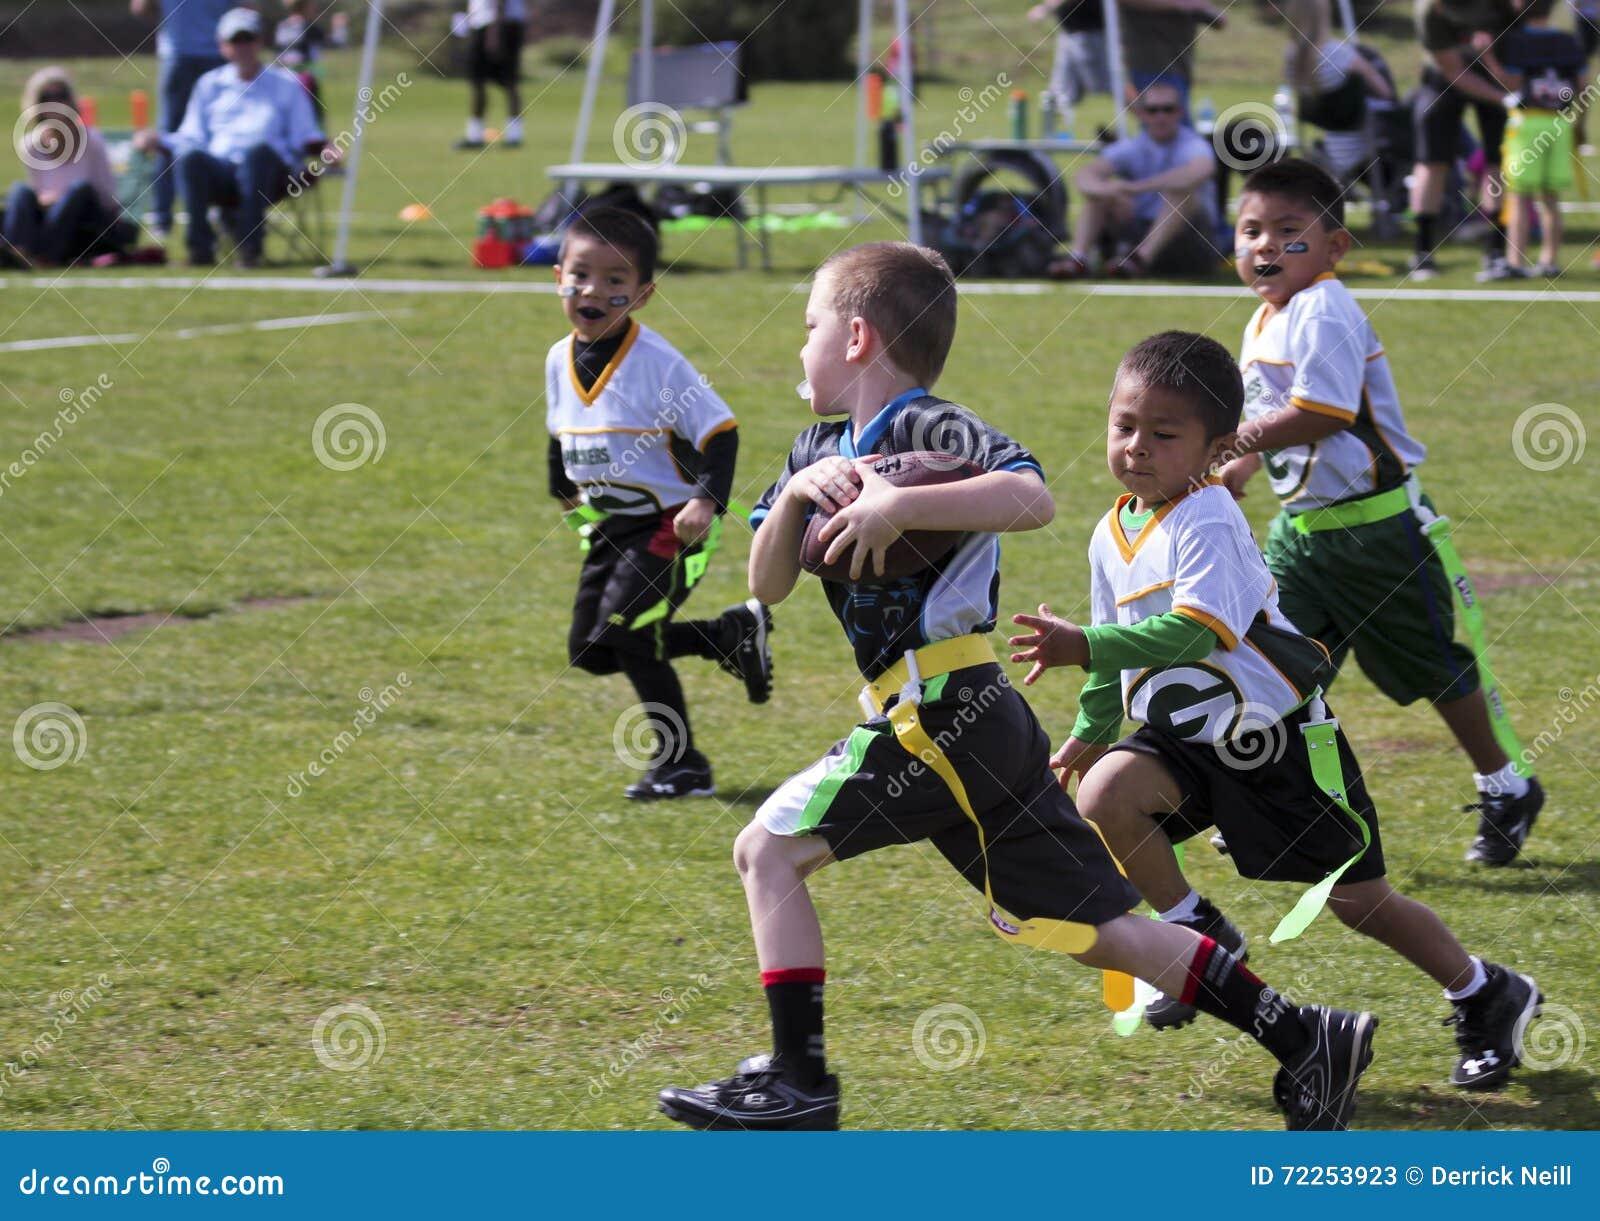 Футбольная игра флага на 5 до 6 год - olds